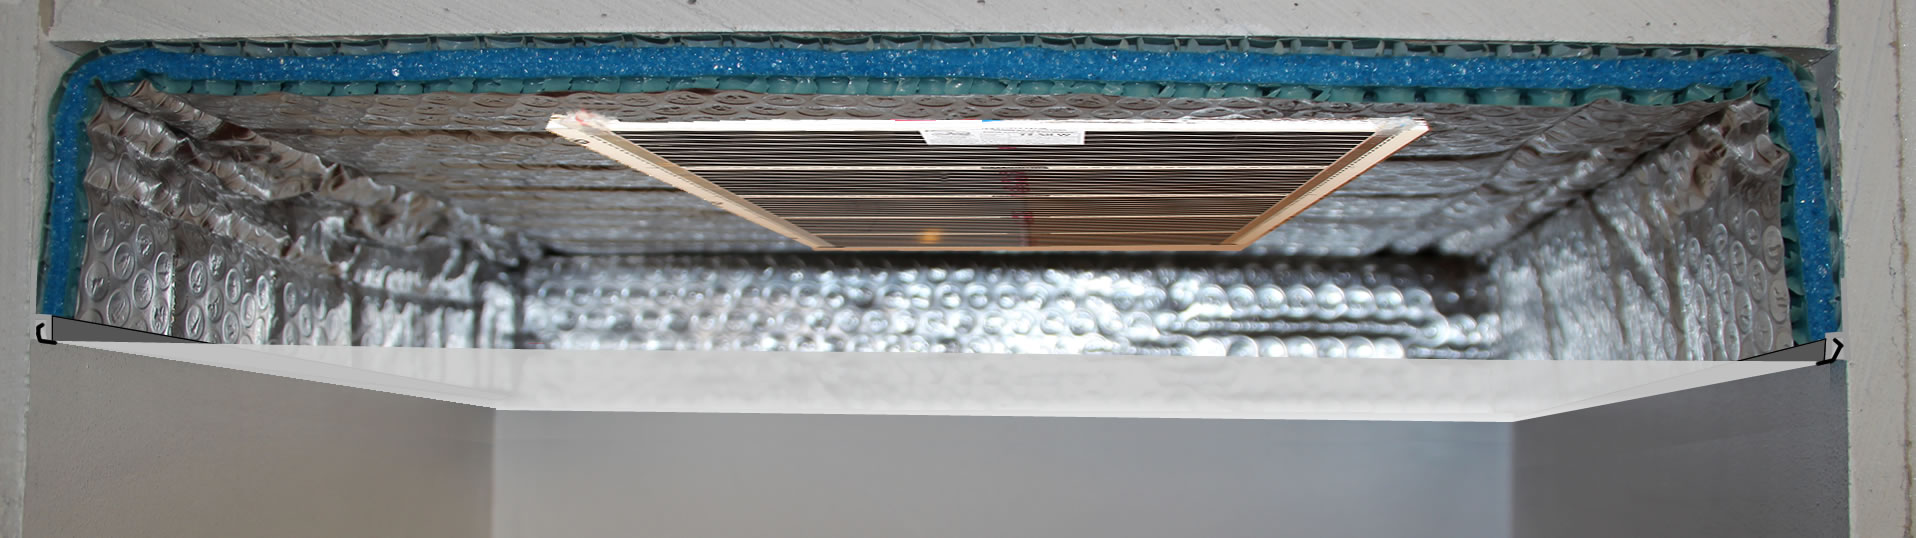 ePan Slim, panneau chauffant pour plafond tendu rayonnant